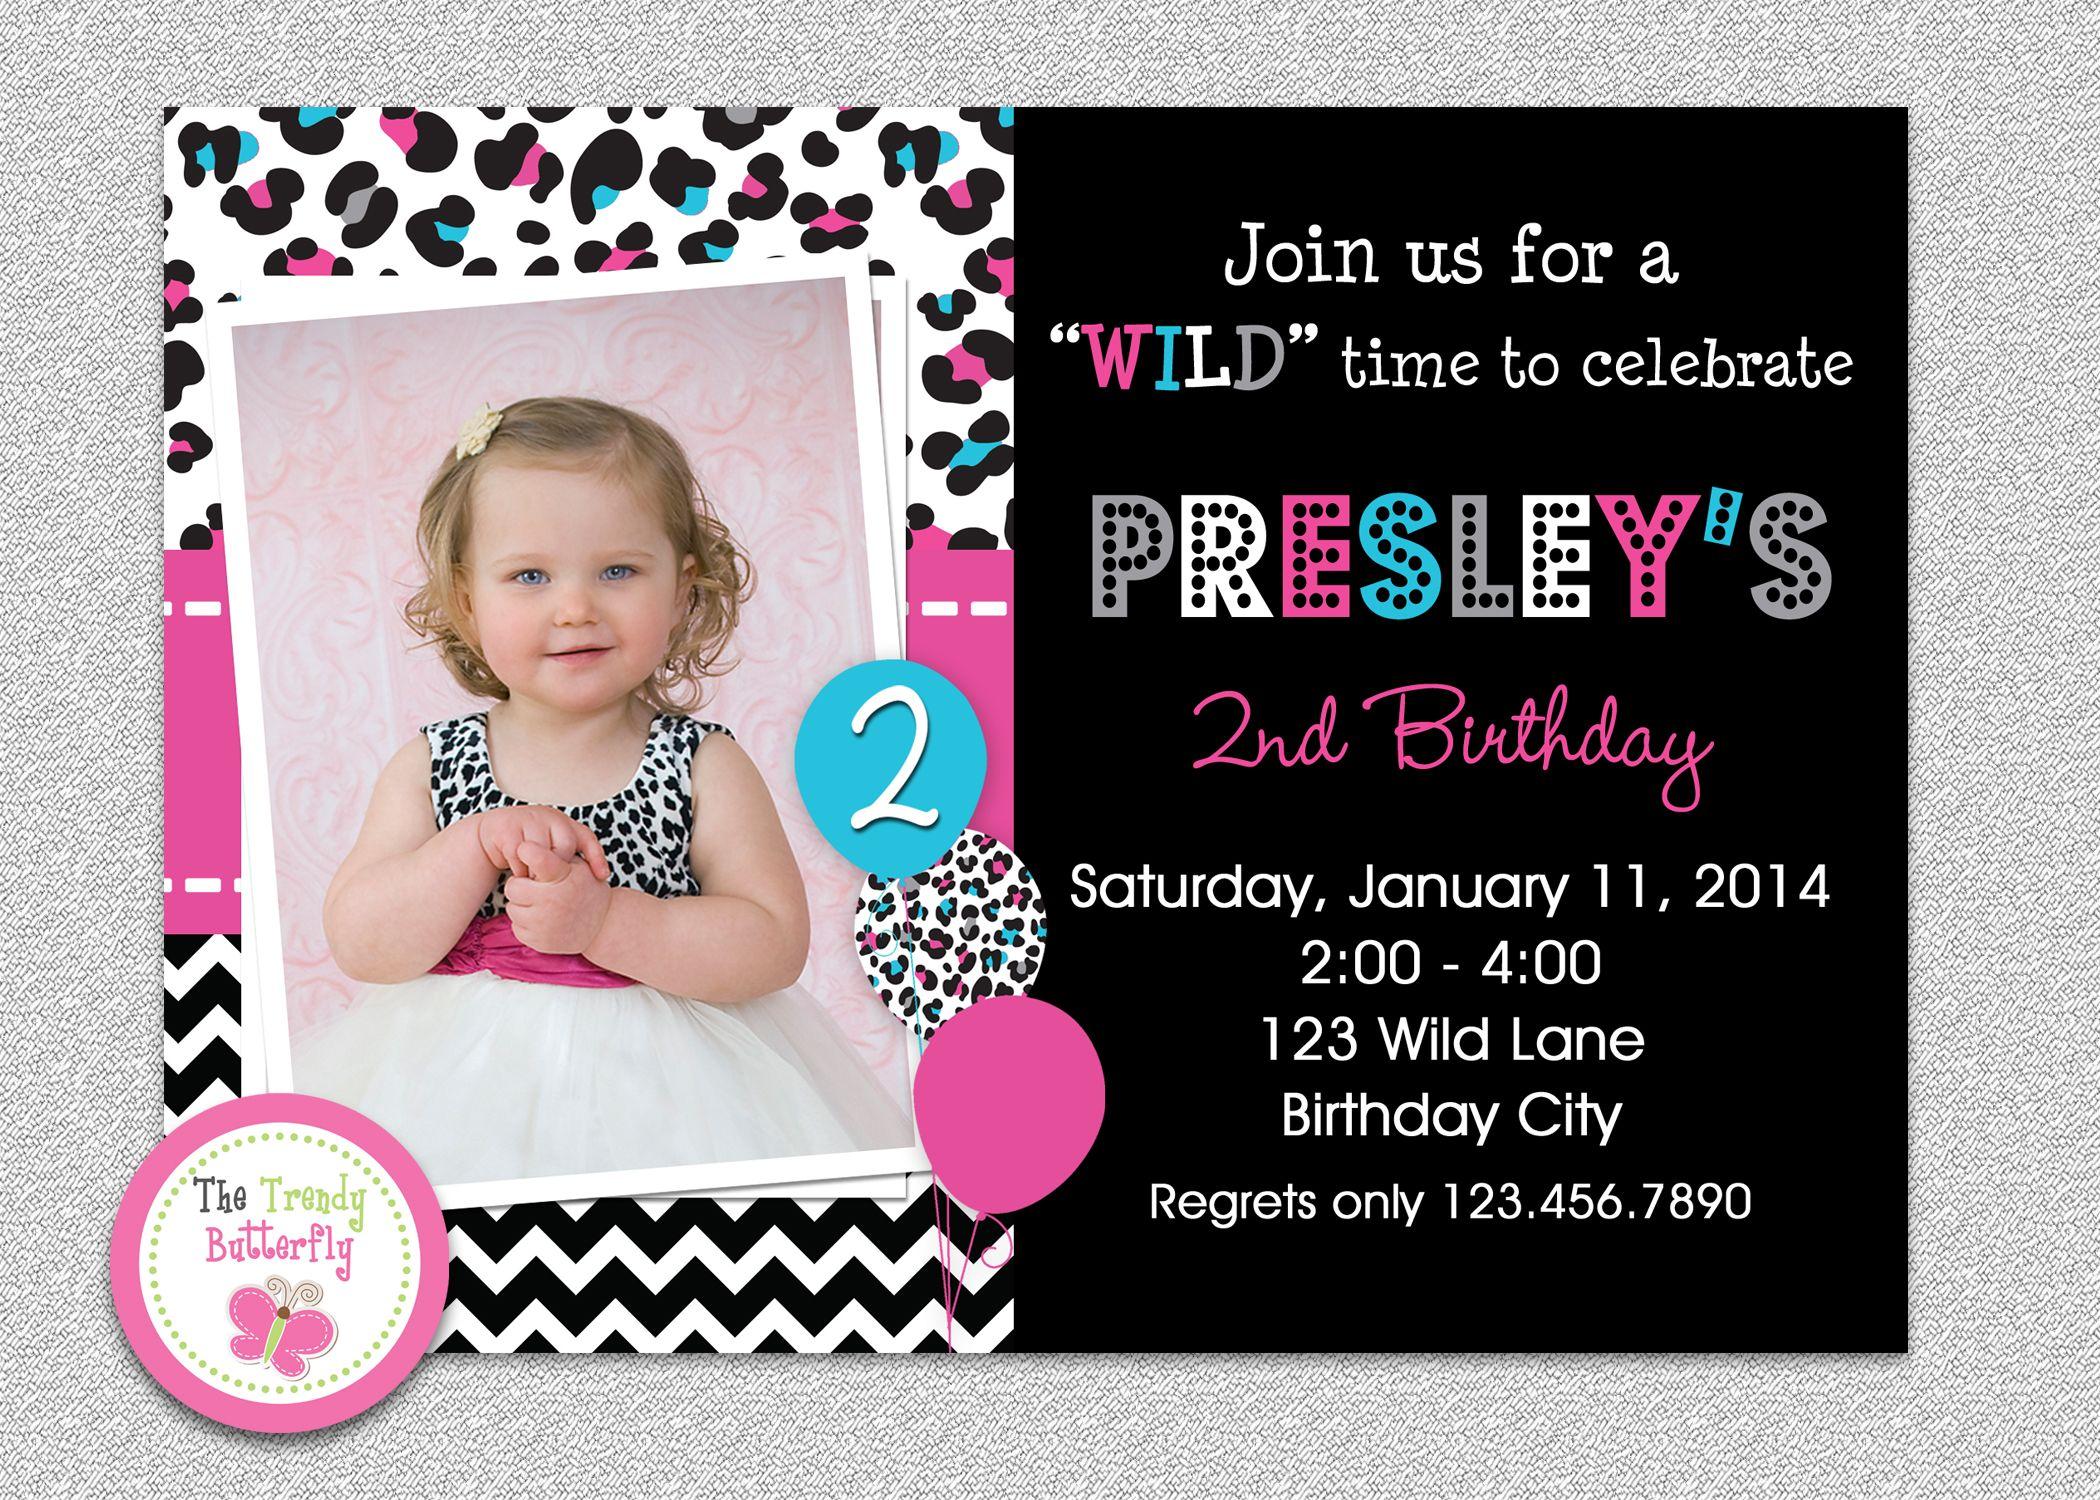 Leopard Birthday Party Invitations | Leopard birthday, Birthdays and ...